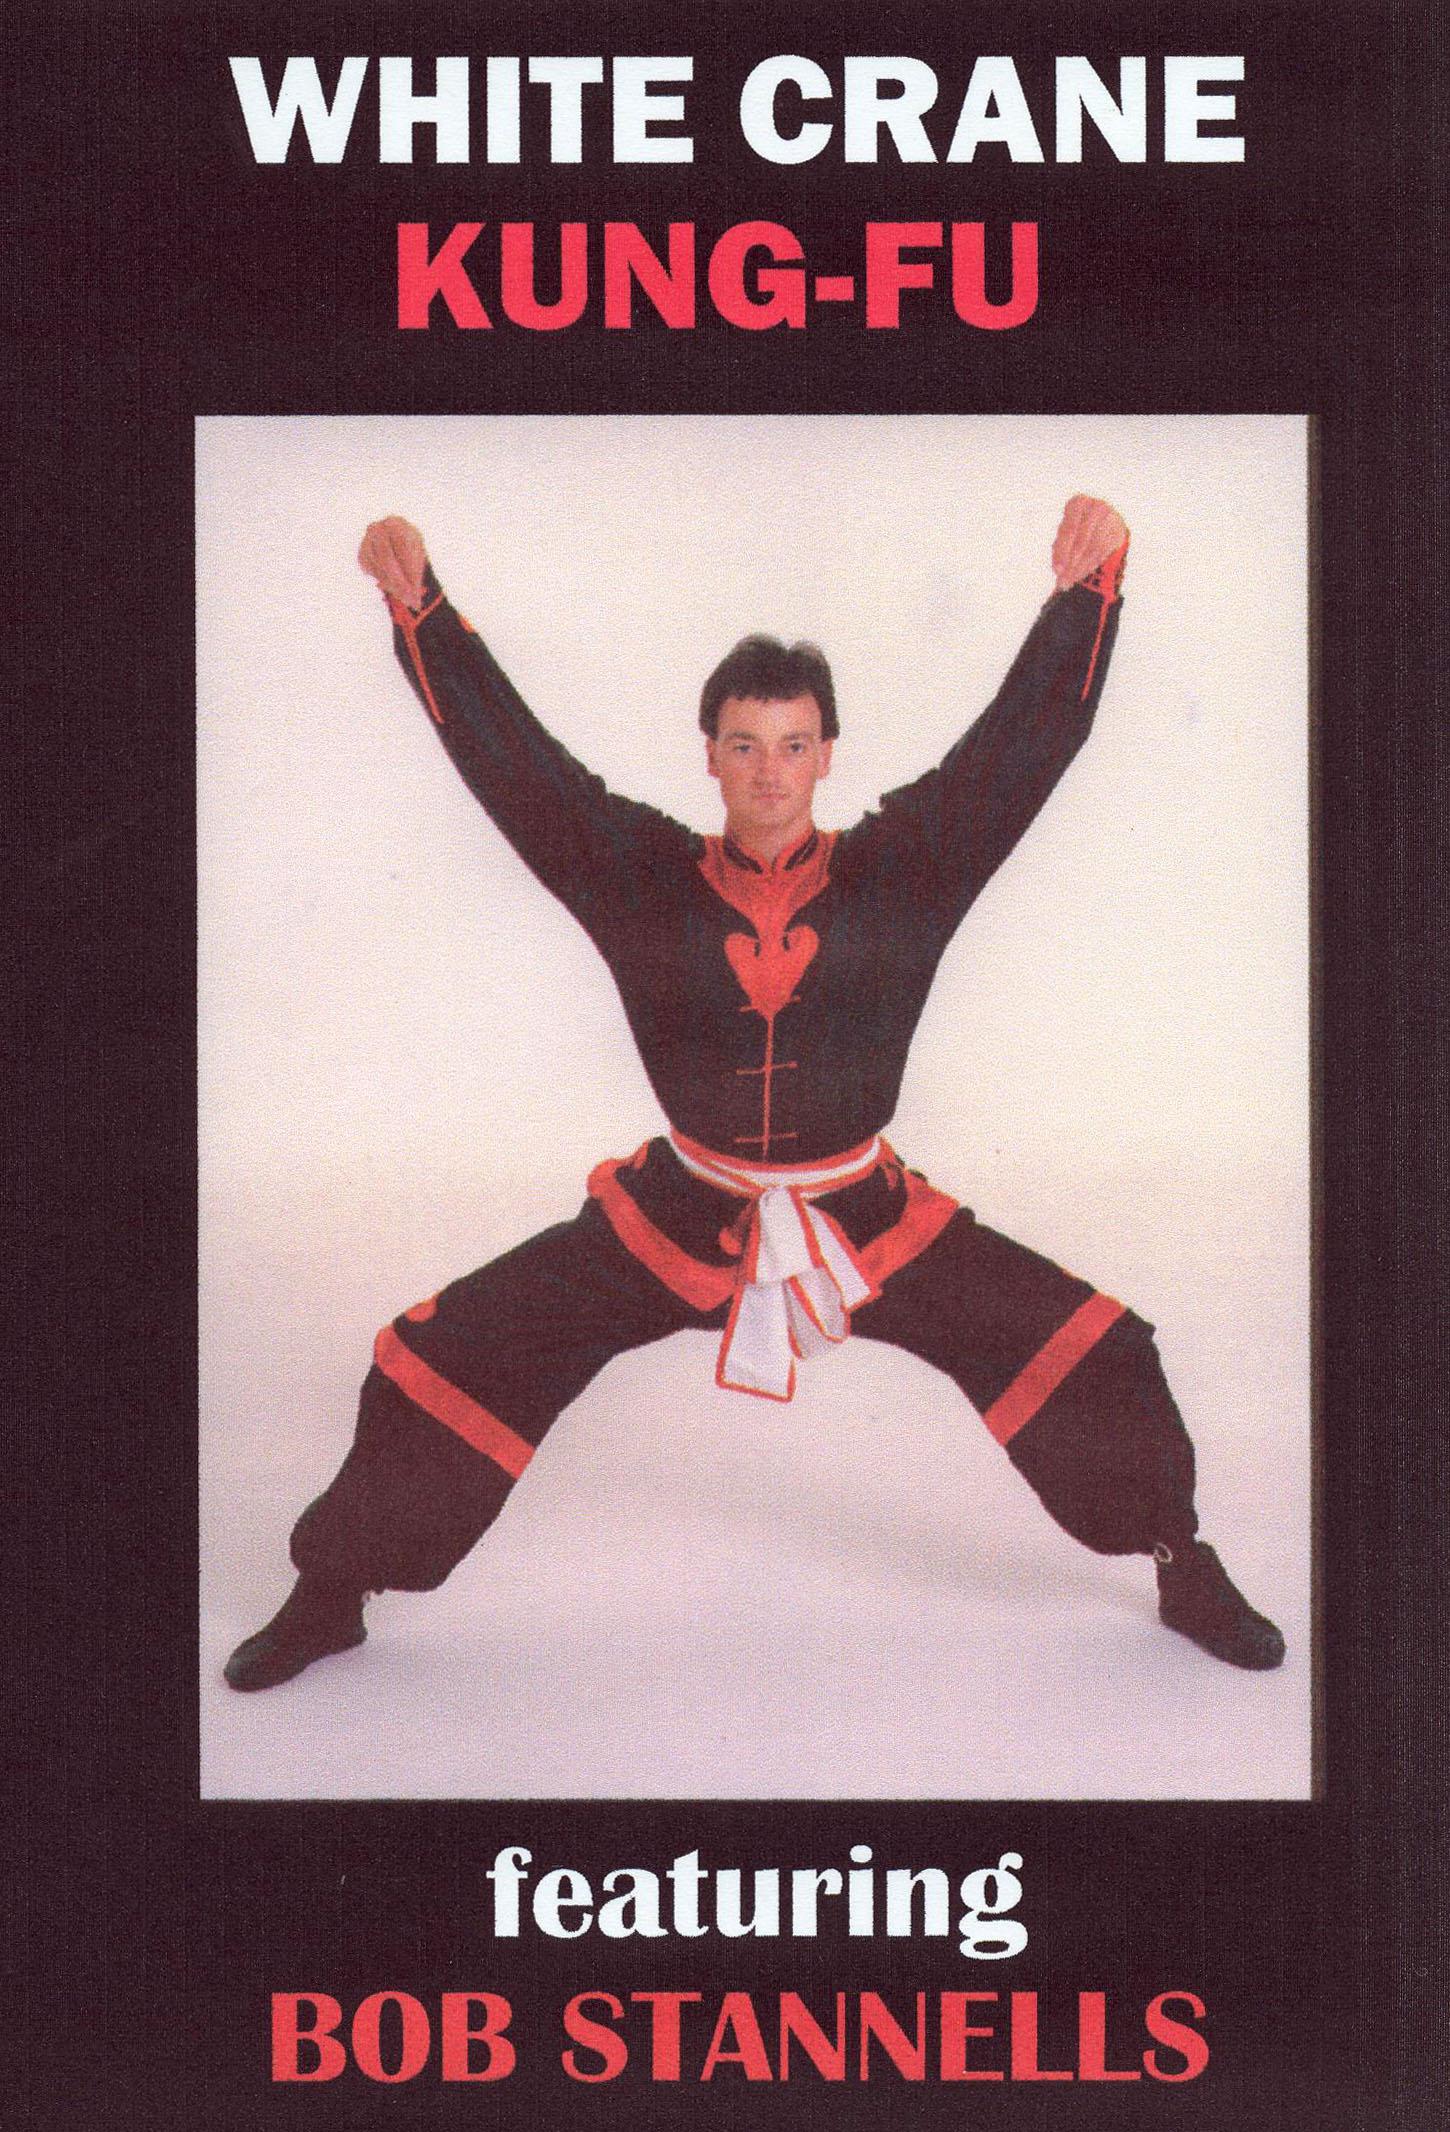 White Crane Kung-Fu